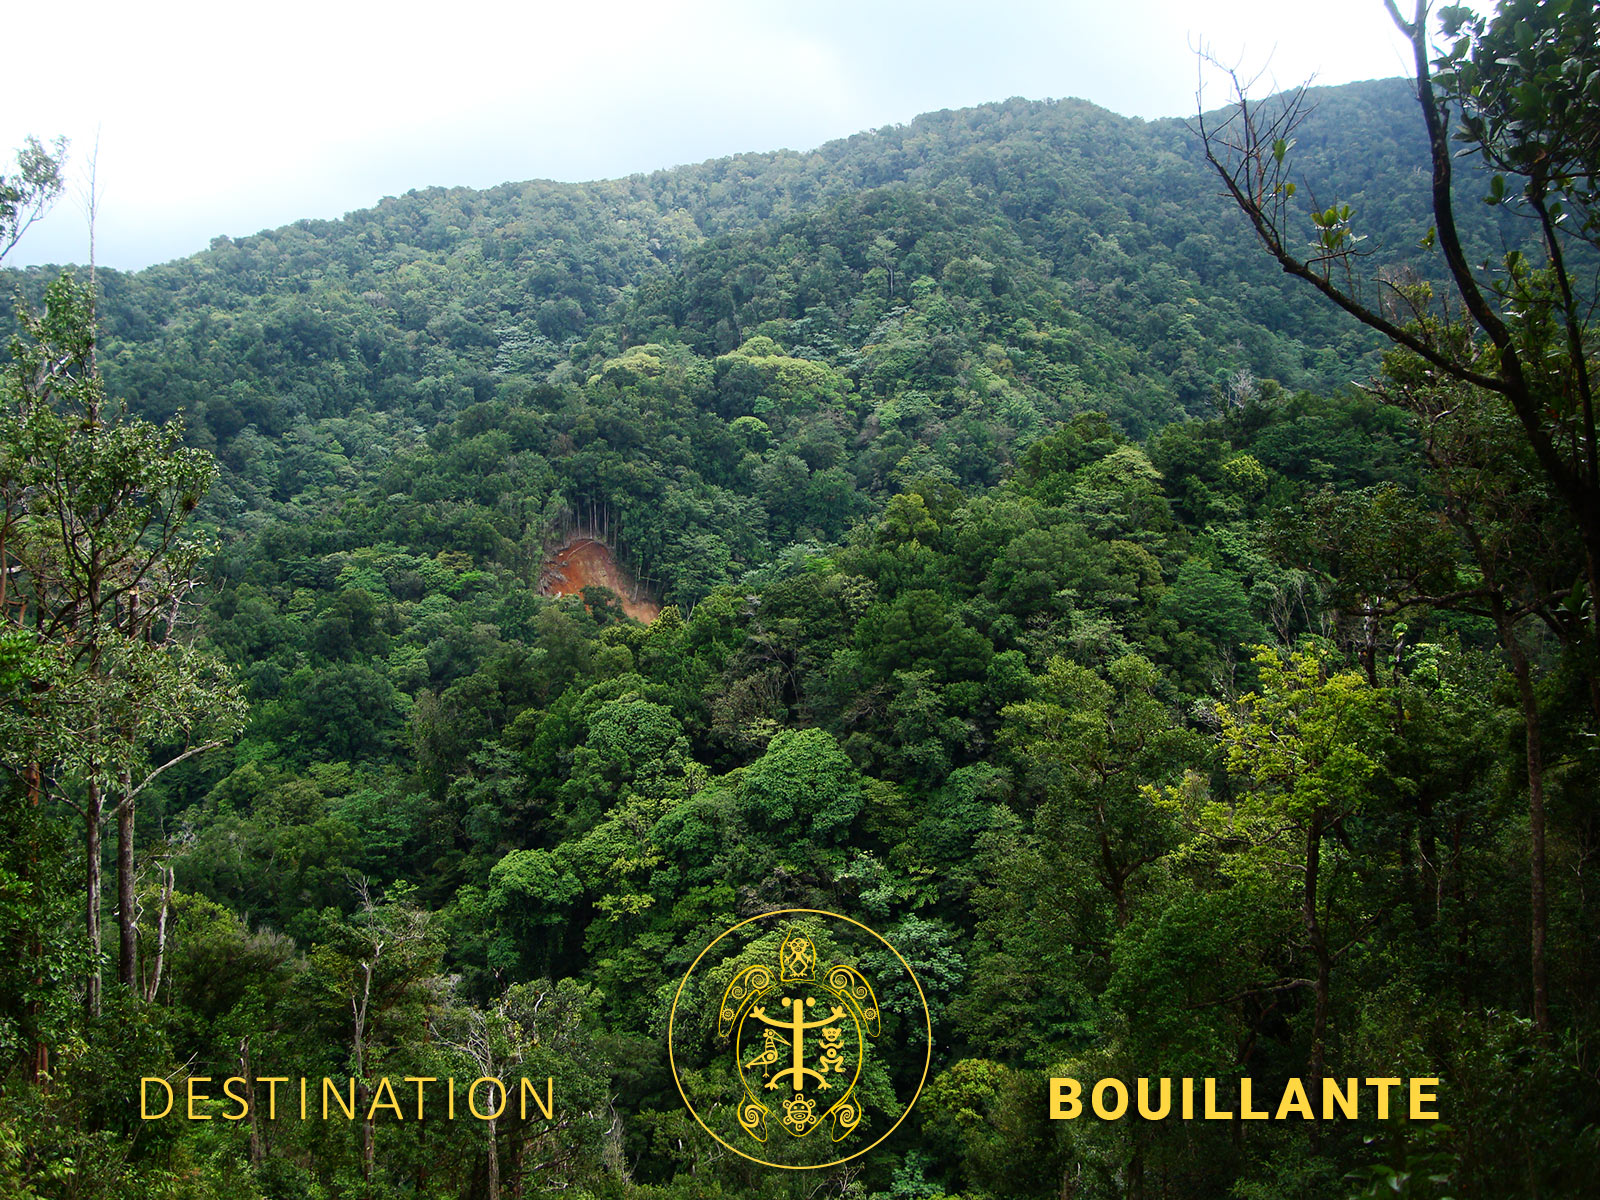 Montagne de Bouillante